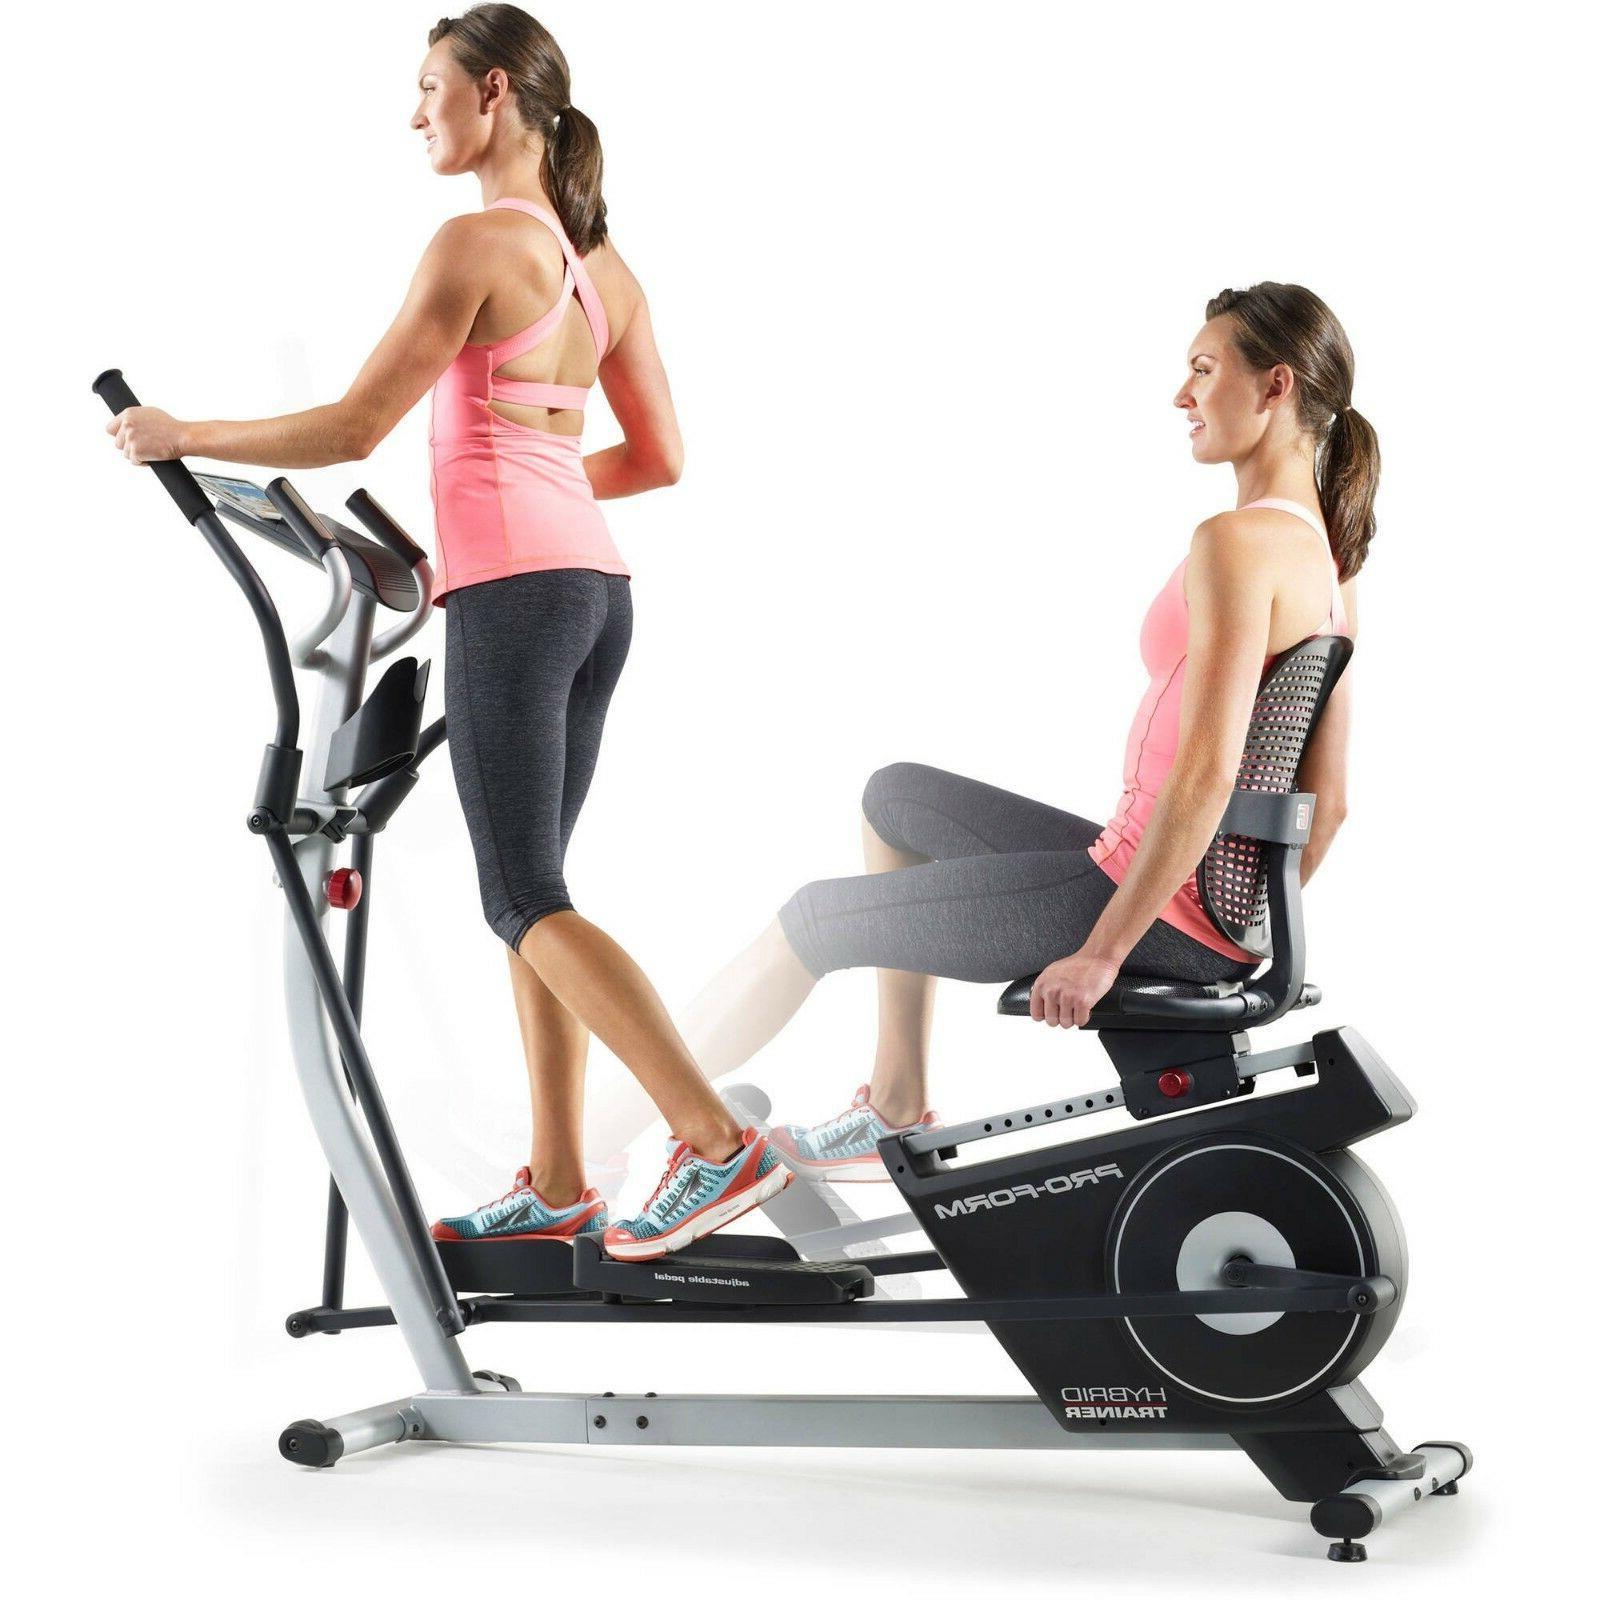 hybrid trainer 2 in 1 elliptical